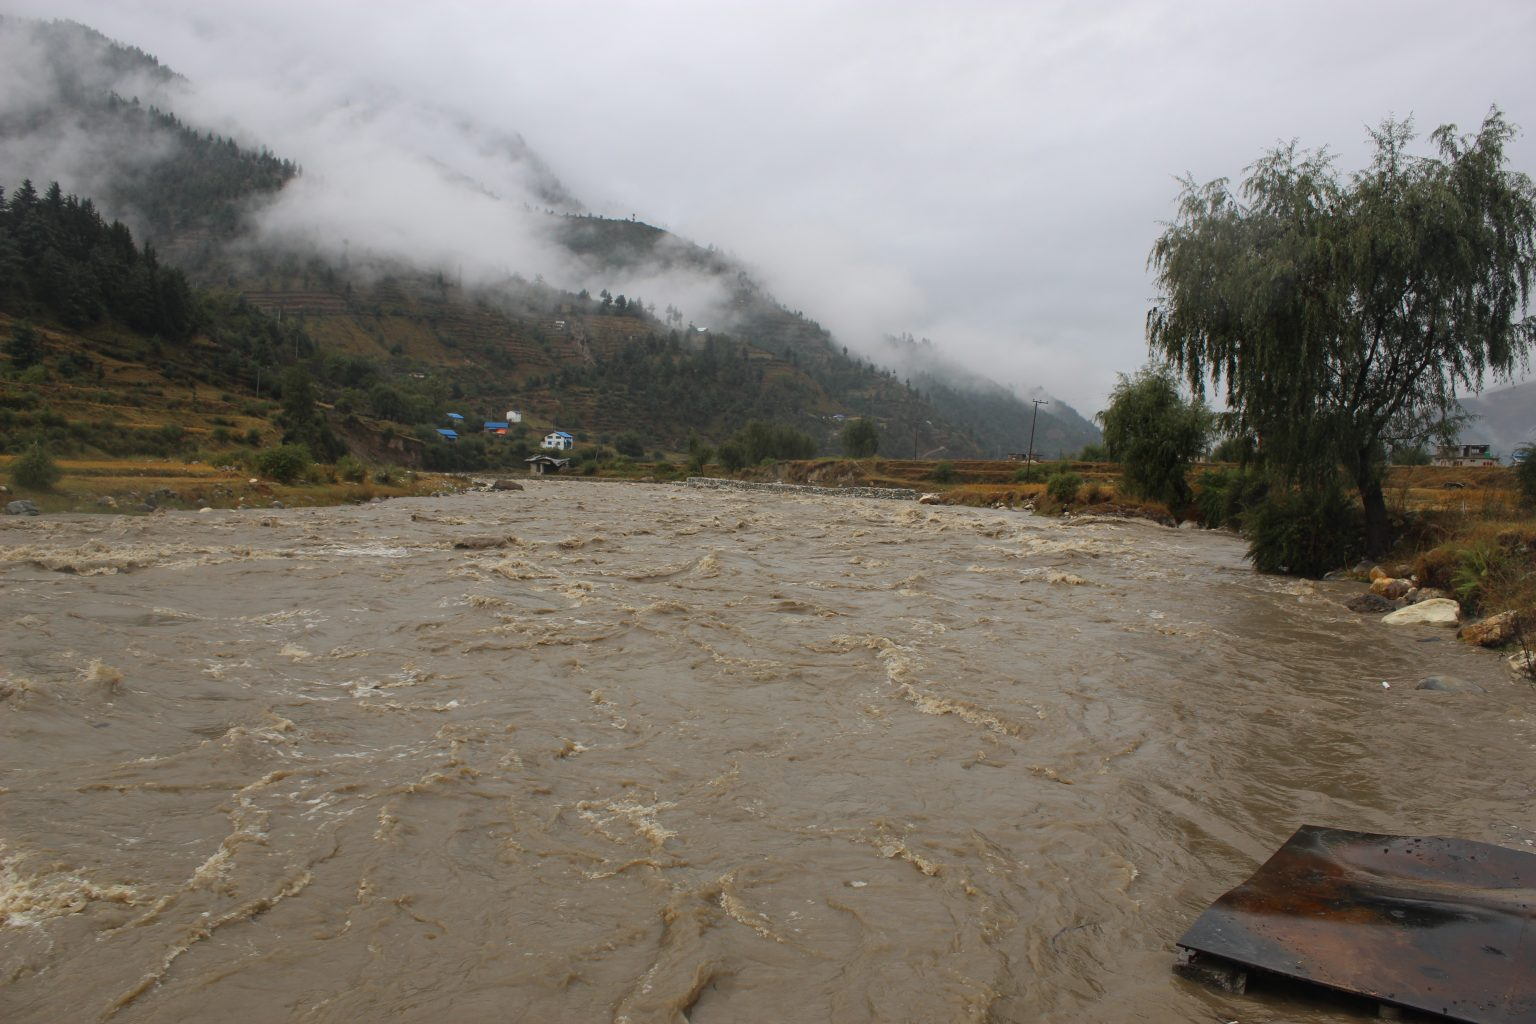 जलवायु परिवर्तनले बेमौसमी विपत्ति